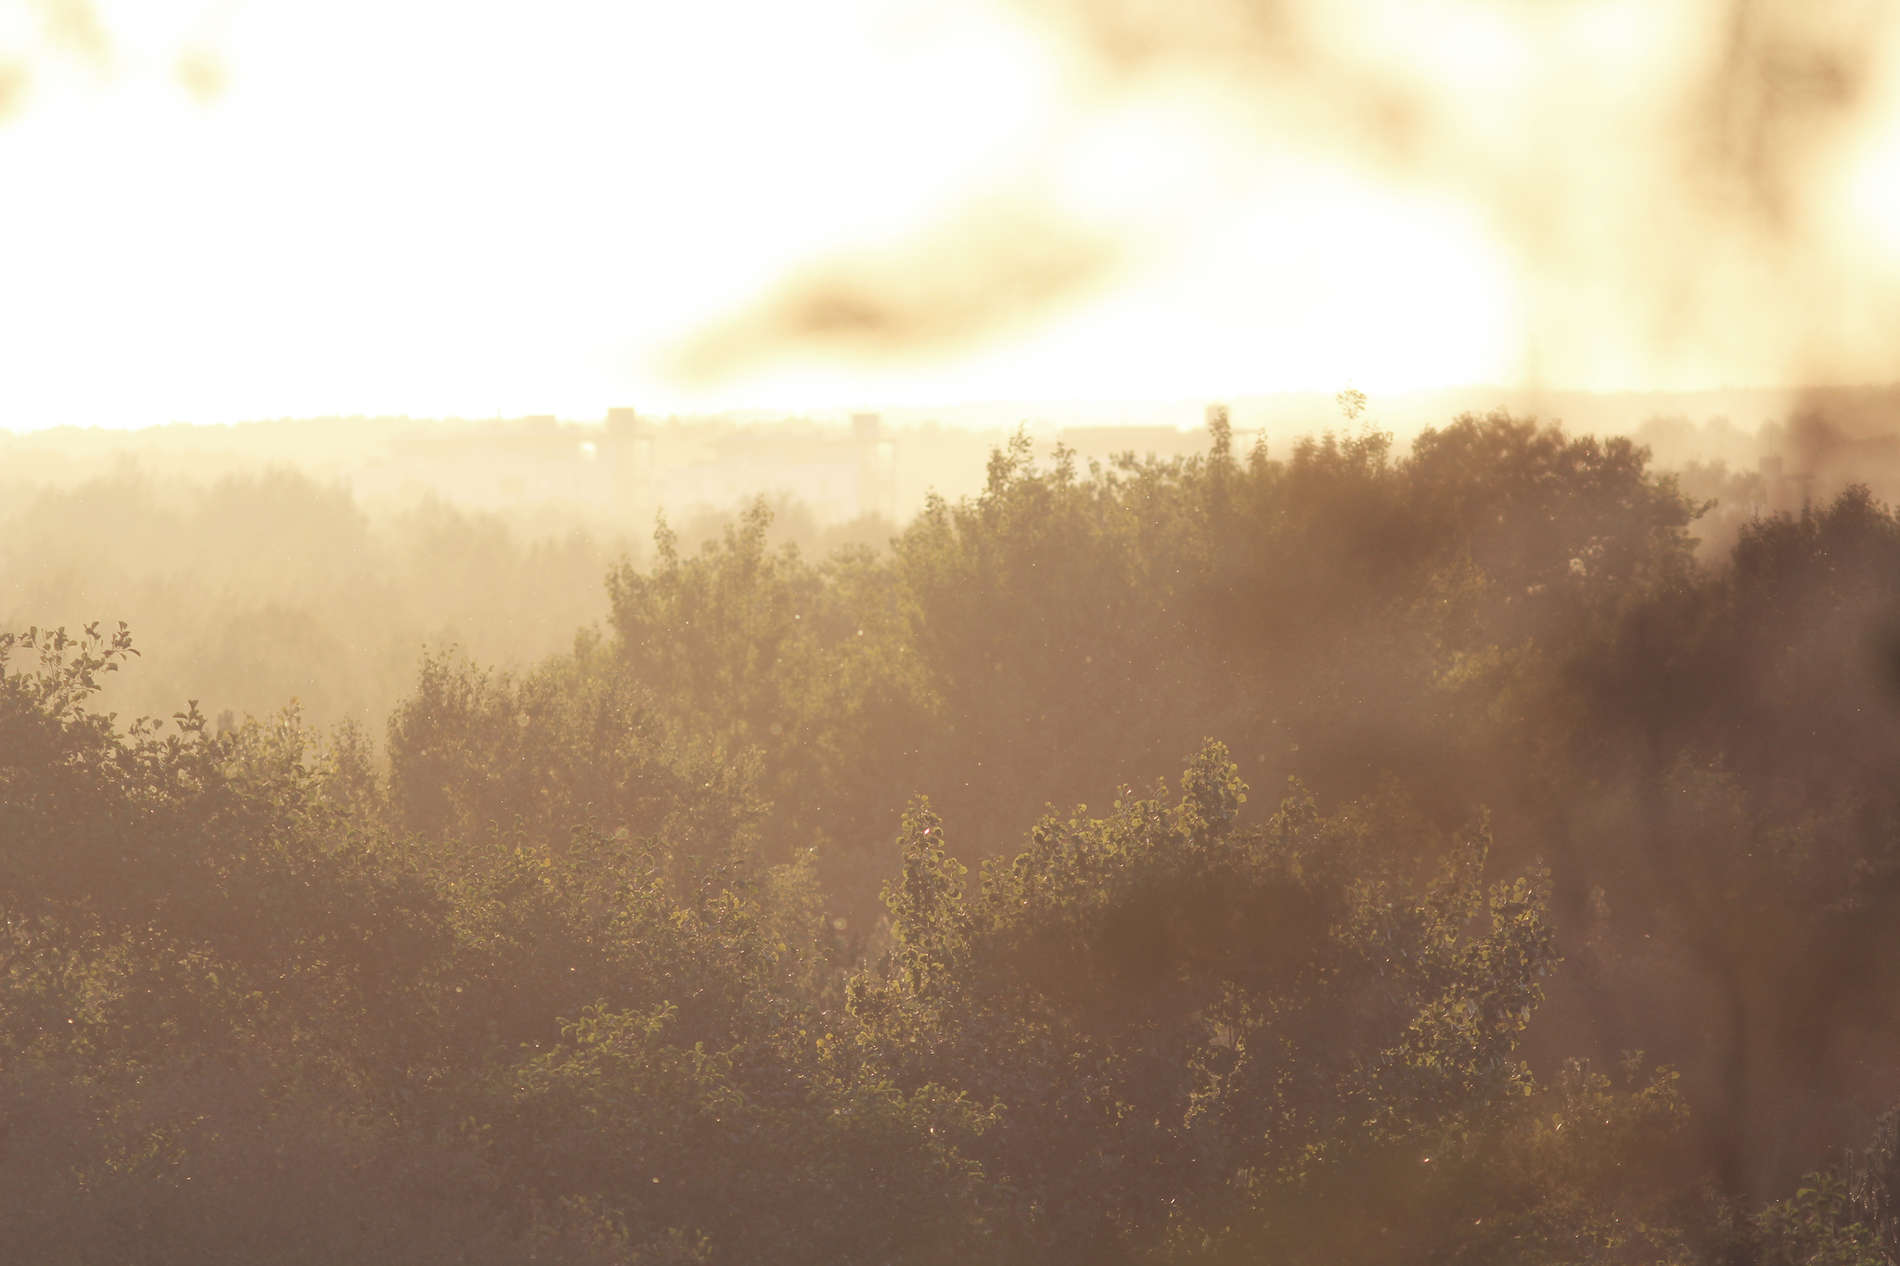 Nõmme-Mustamäe Nature Reserve